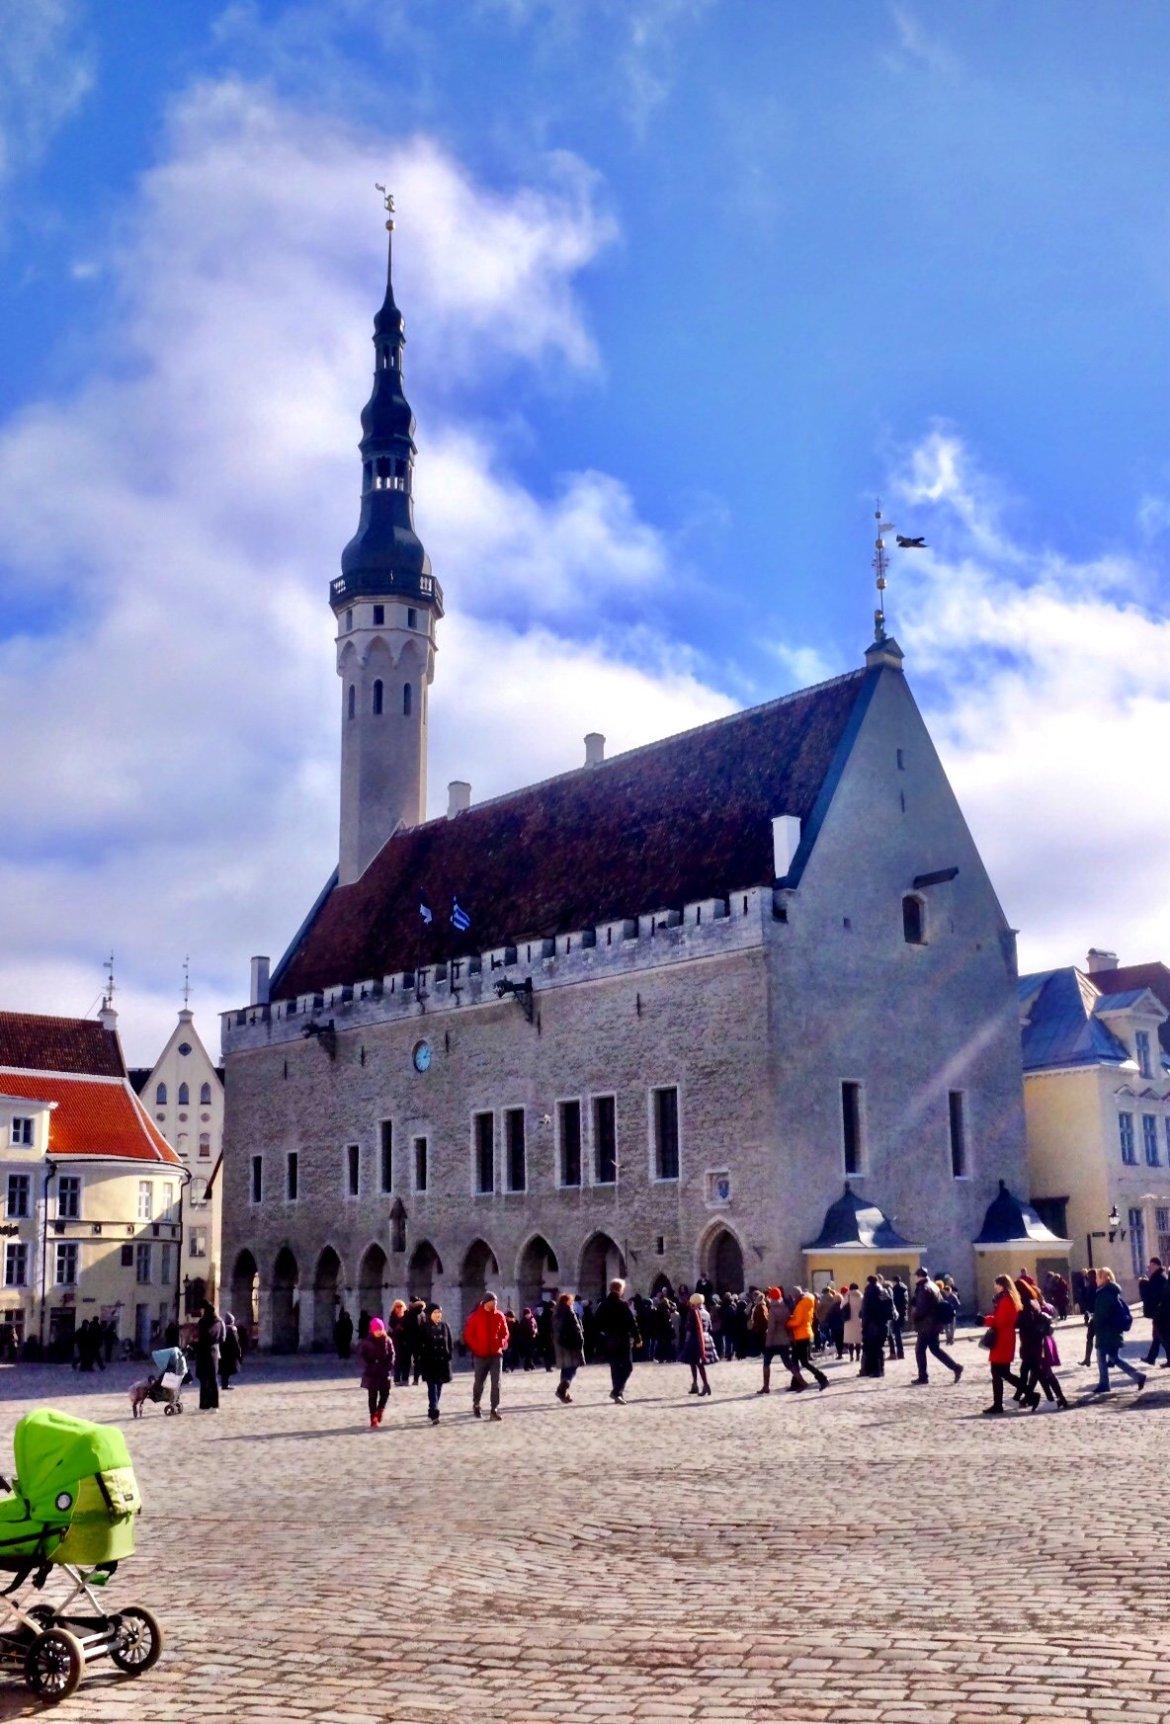 Weekend in Tallinn Tallinn Town Hall by day